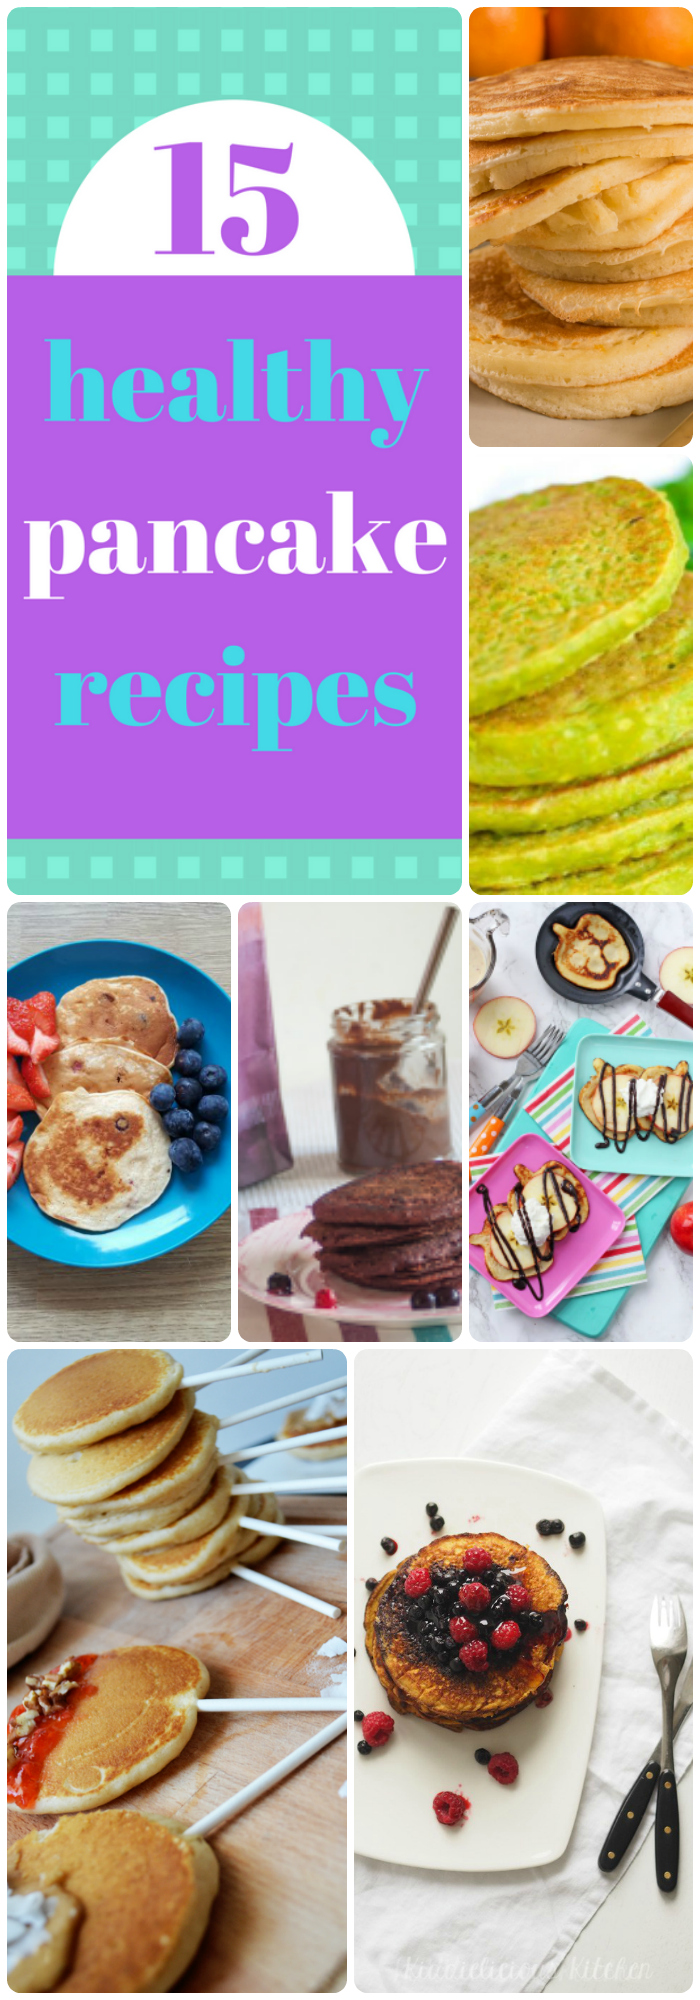 15-healthy-pancake-recipes-pin.jpg